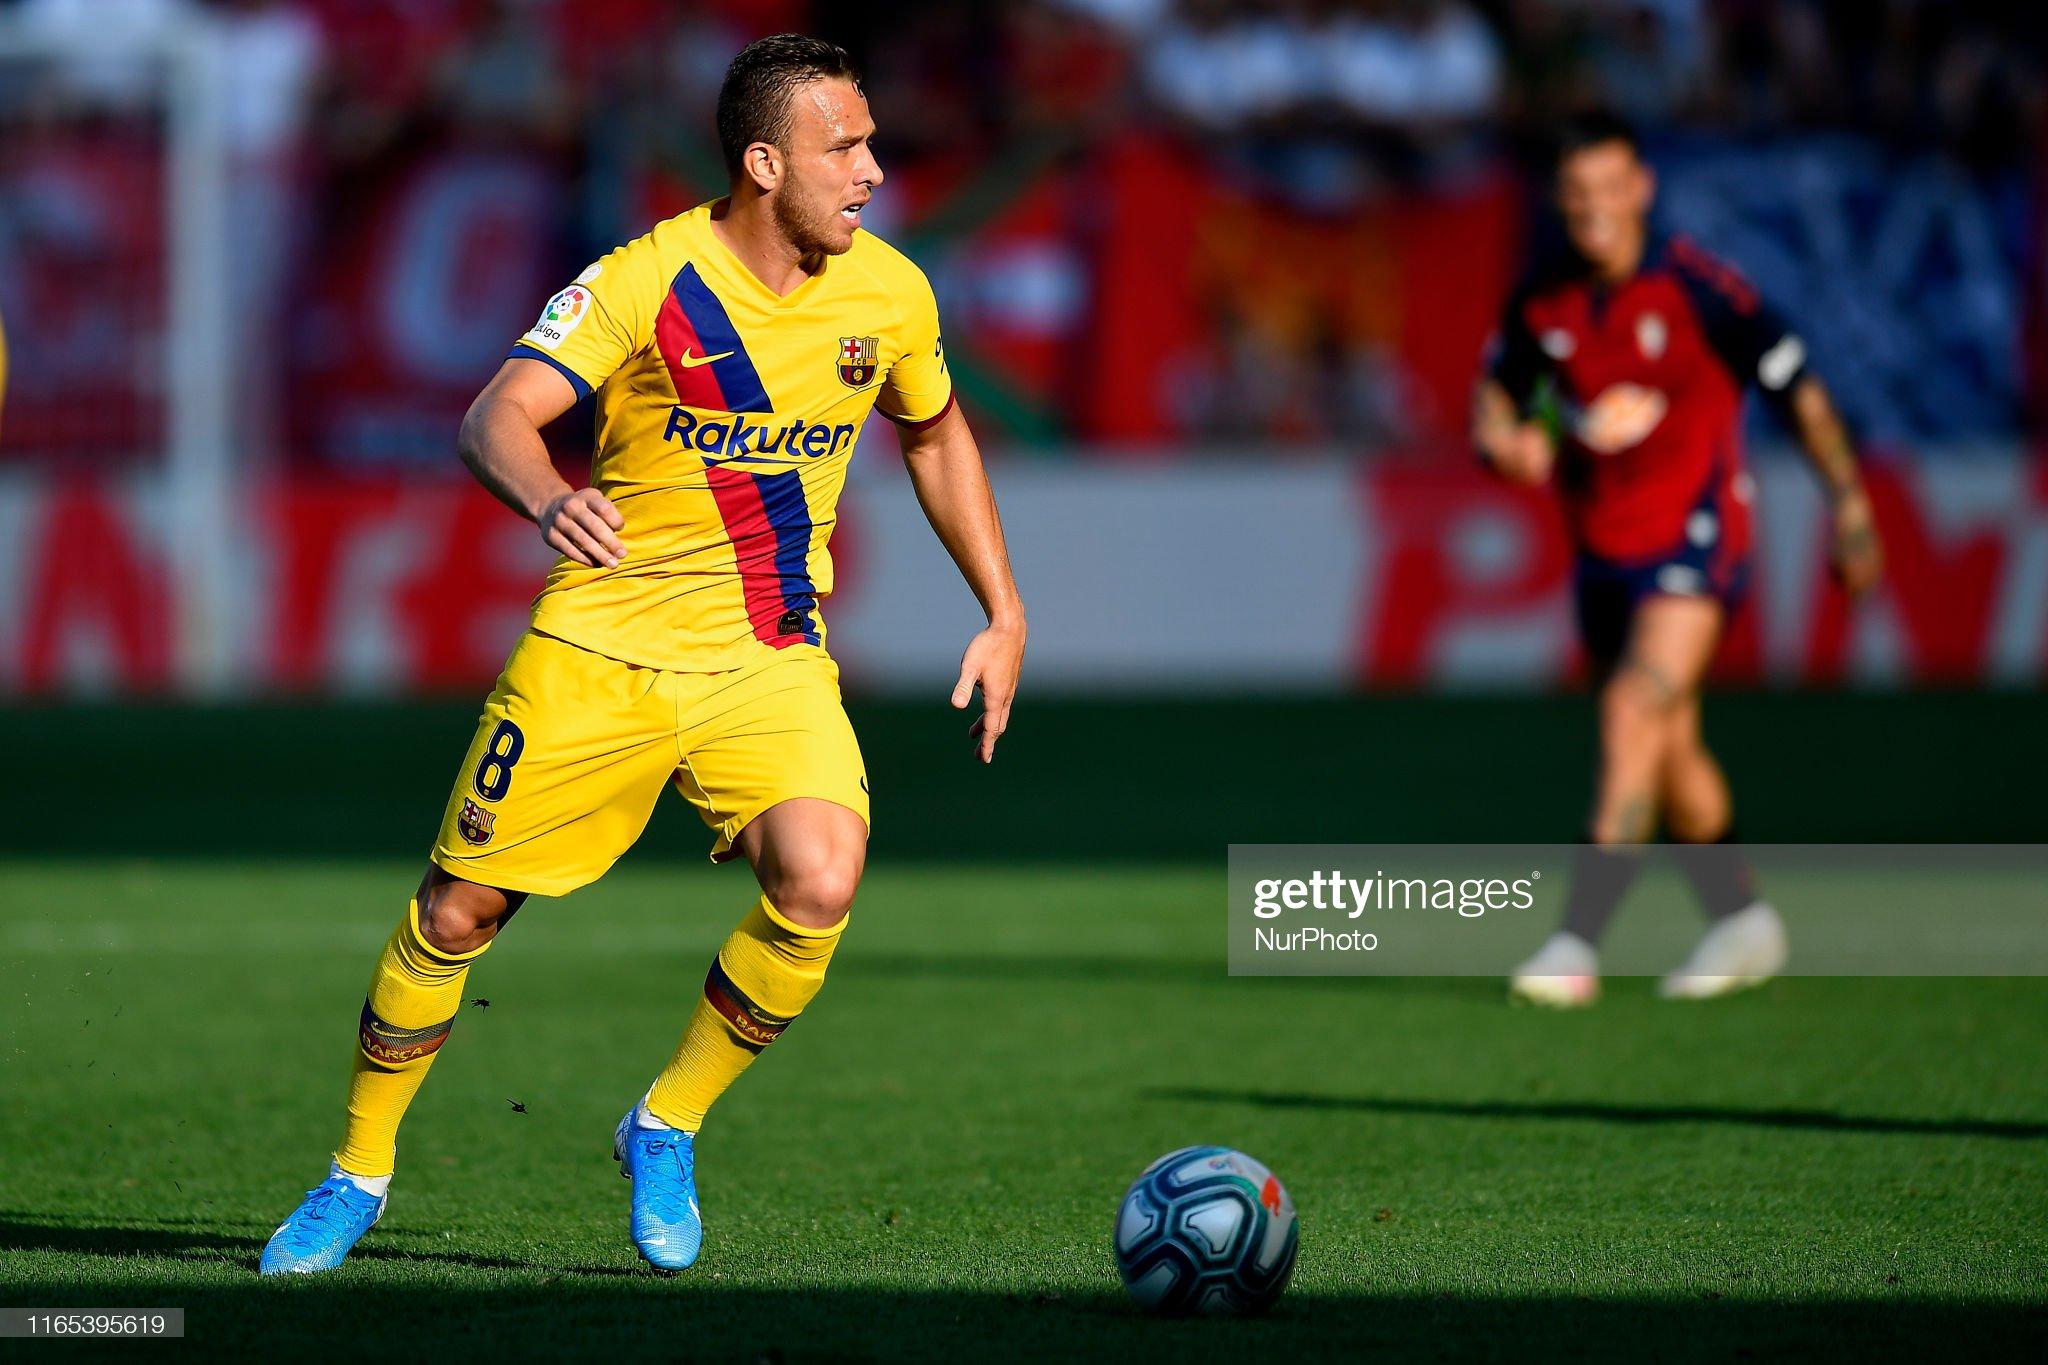 صور مباراة : أوساسونا - برشلونة 2-2 ( 31-08-2019 )  Arthur-melo-of-barcelona-in-action-during-the-liga-match-between-ca-picture-id1165395619?s=2048x2048